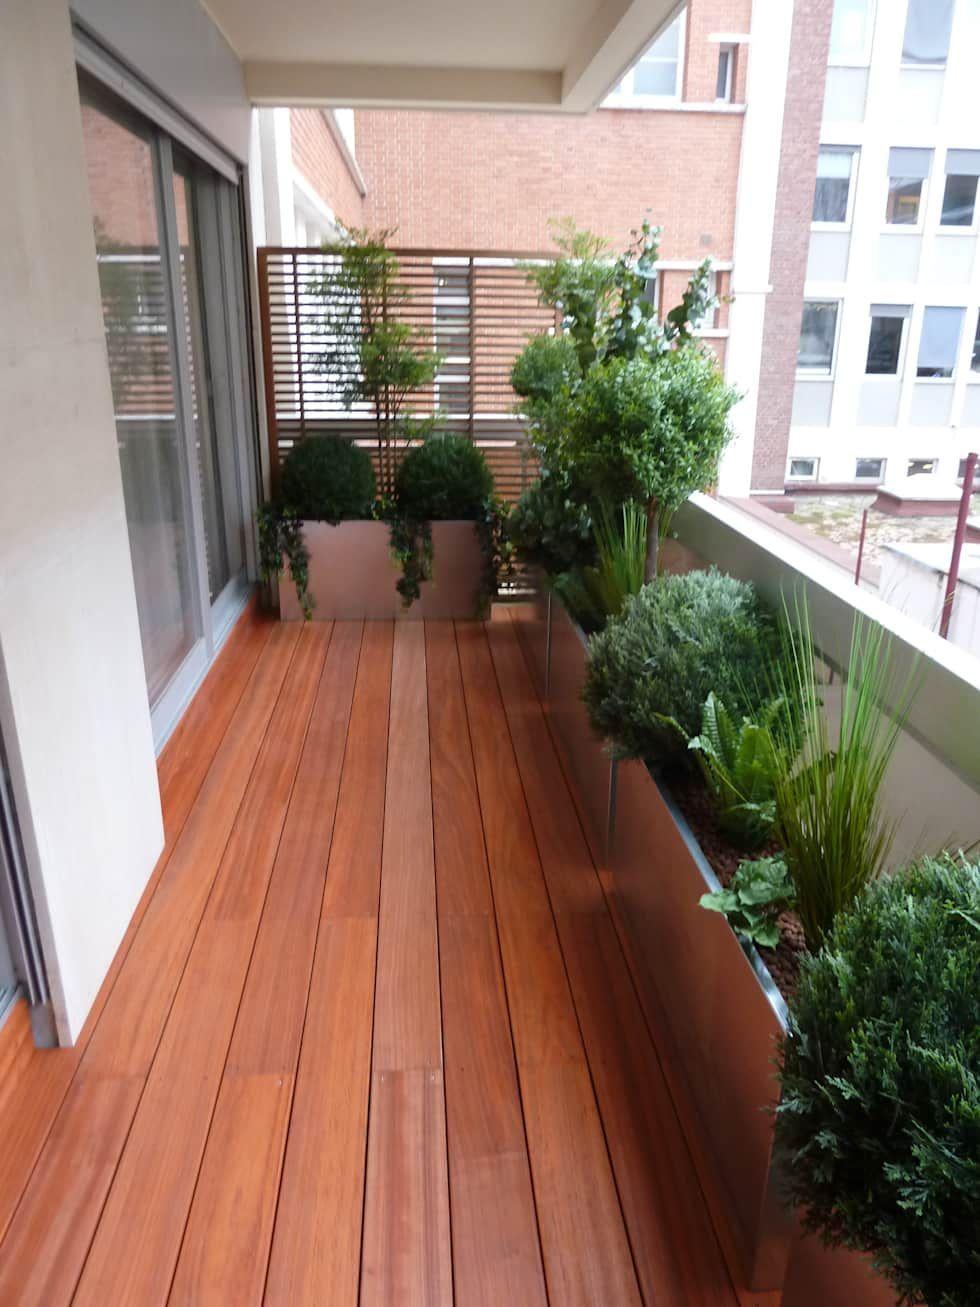 Photo of Terrasse von Scènes d'extérieur #Balcony Garden #Balcony Garden apartment #Bal…